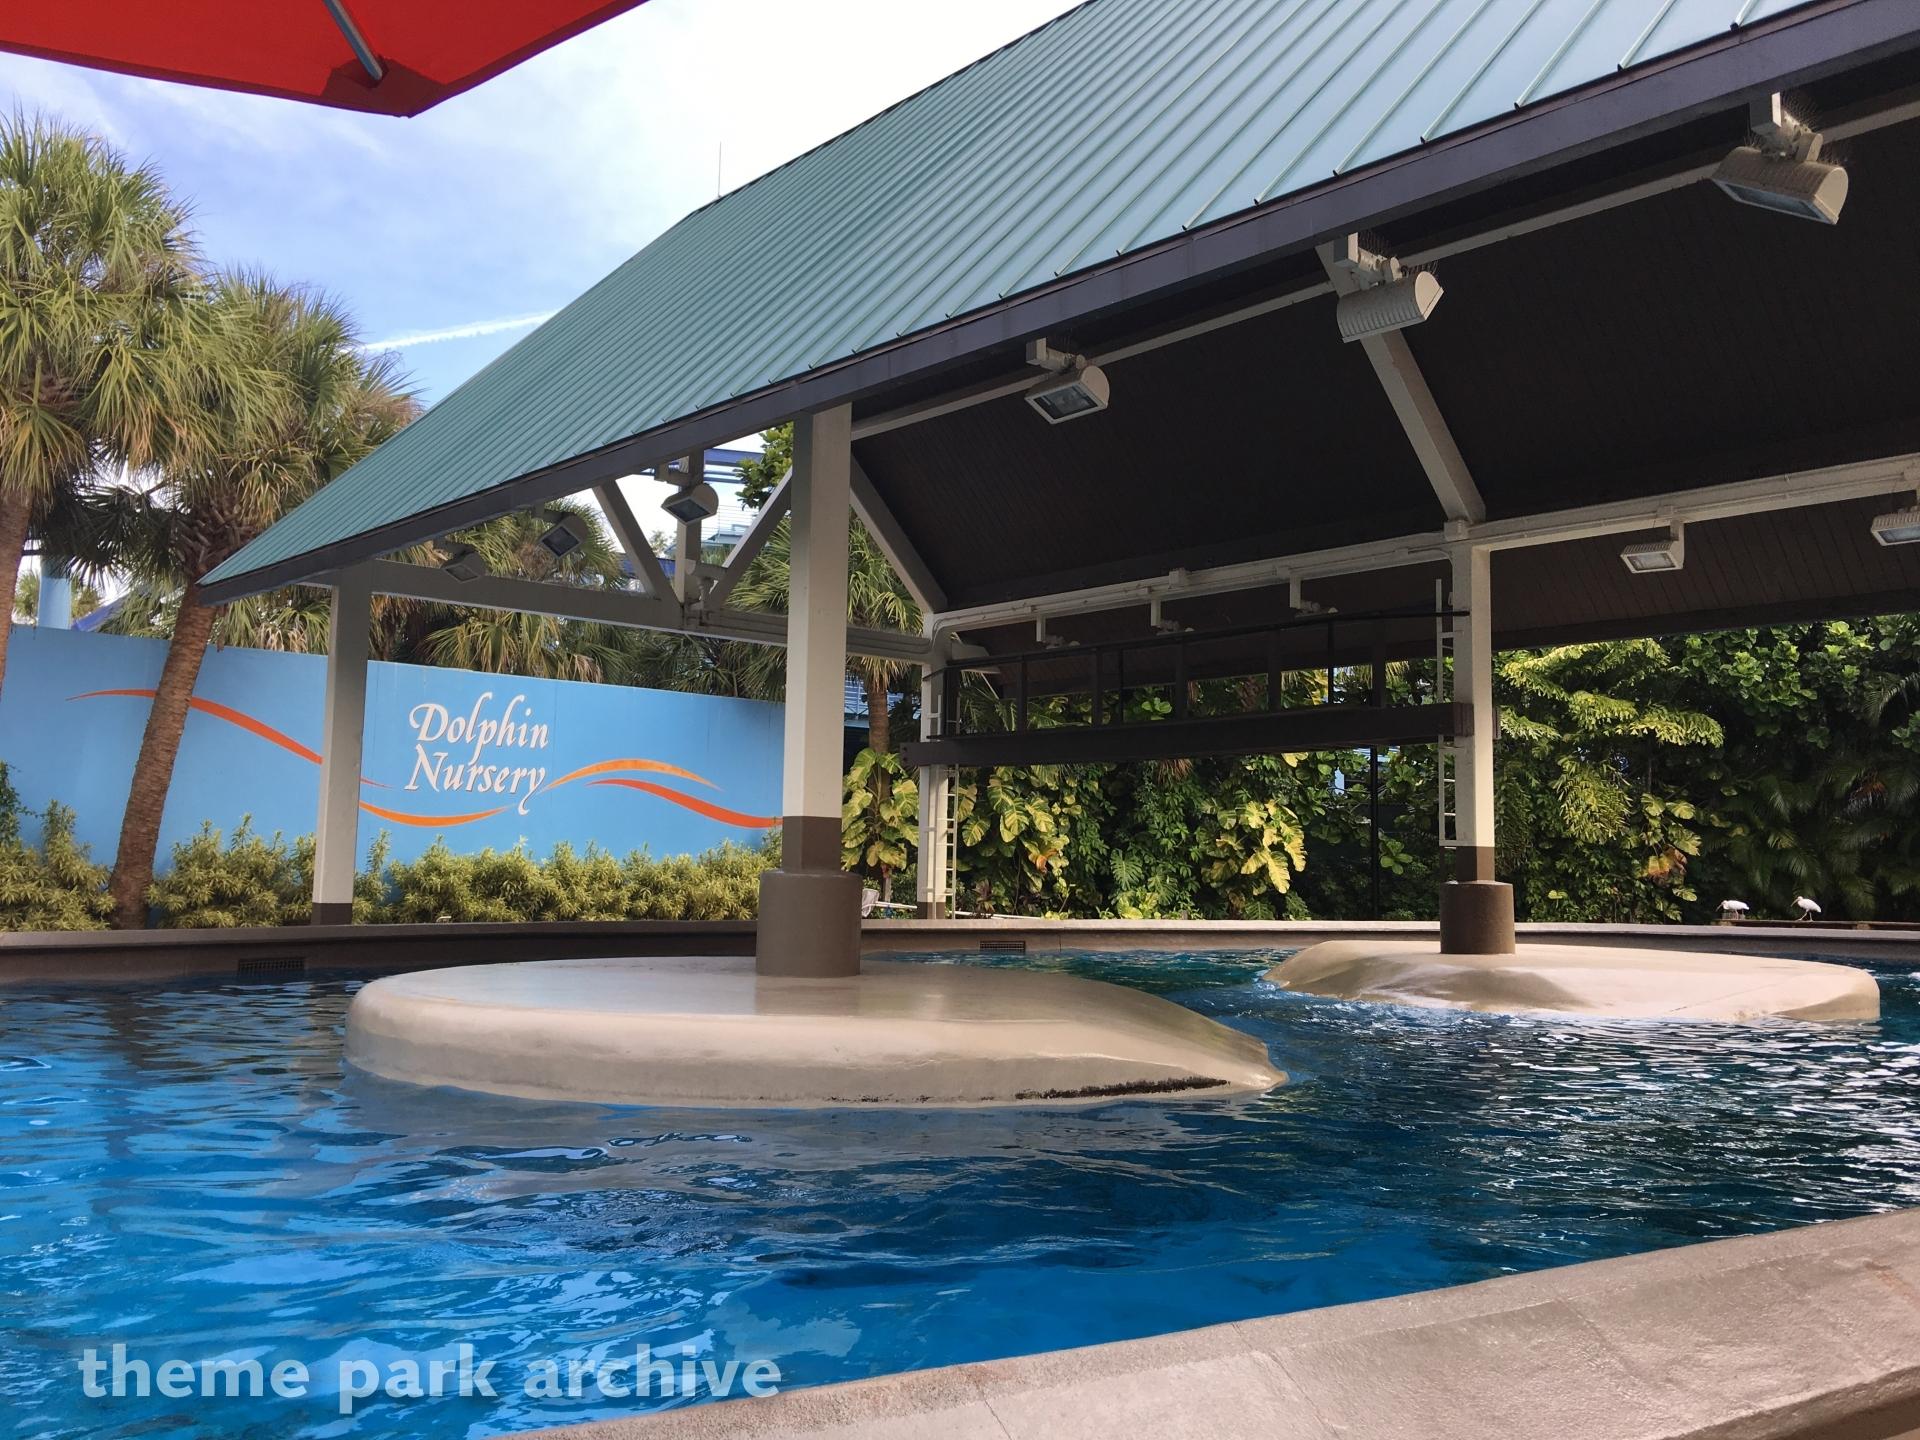 Dolphin Nursery at SeaWorld Orlando